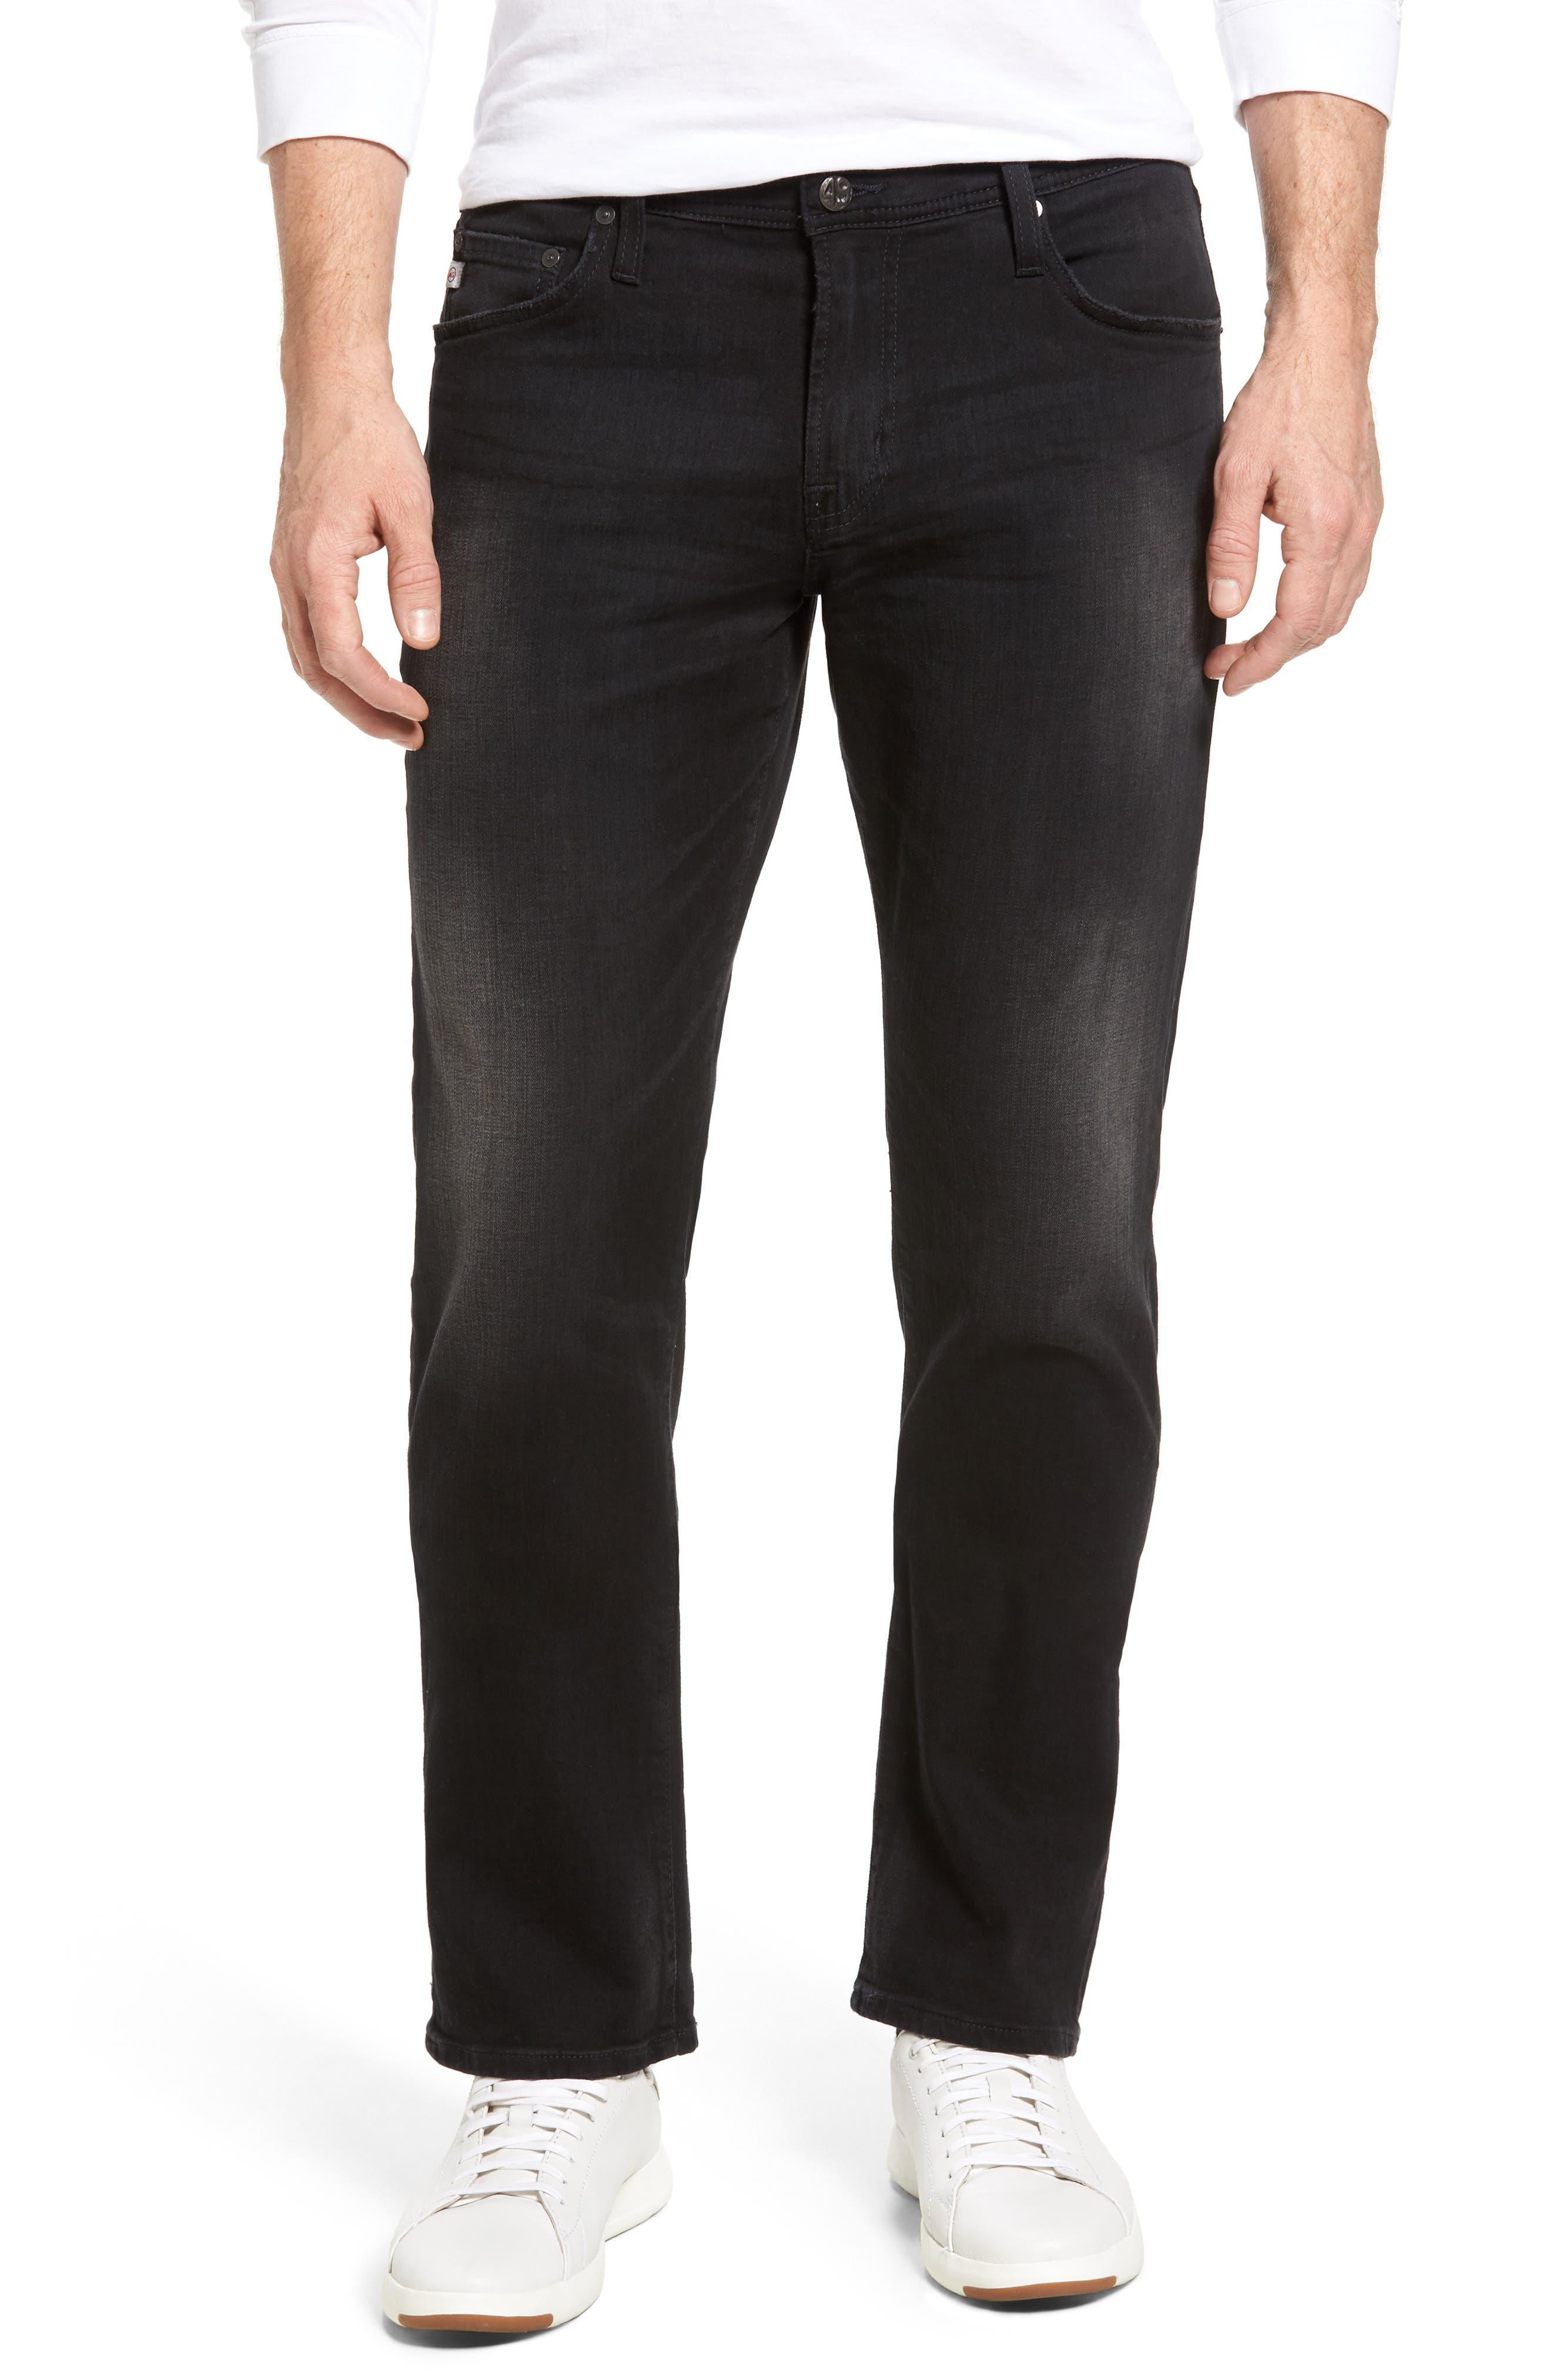 Graduate Slim Straight Leg Jeans,                         Main,                         color, 3 Years Cinema